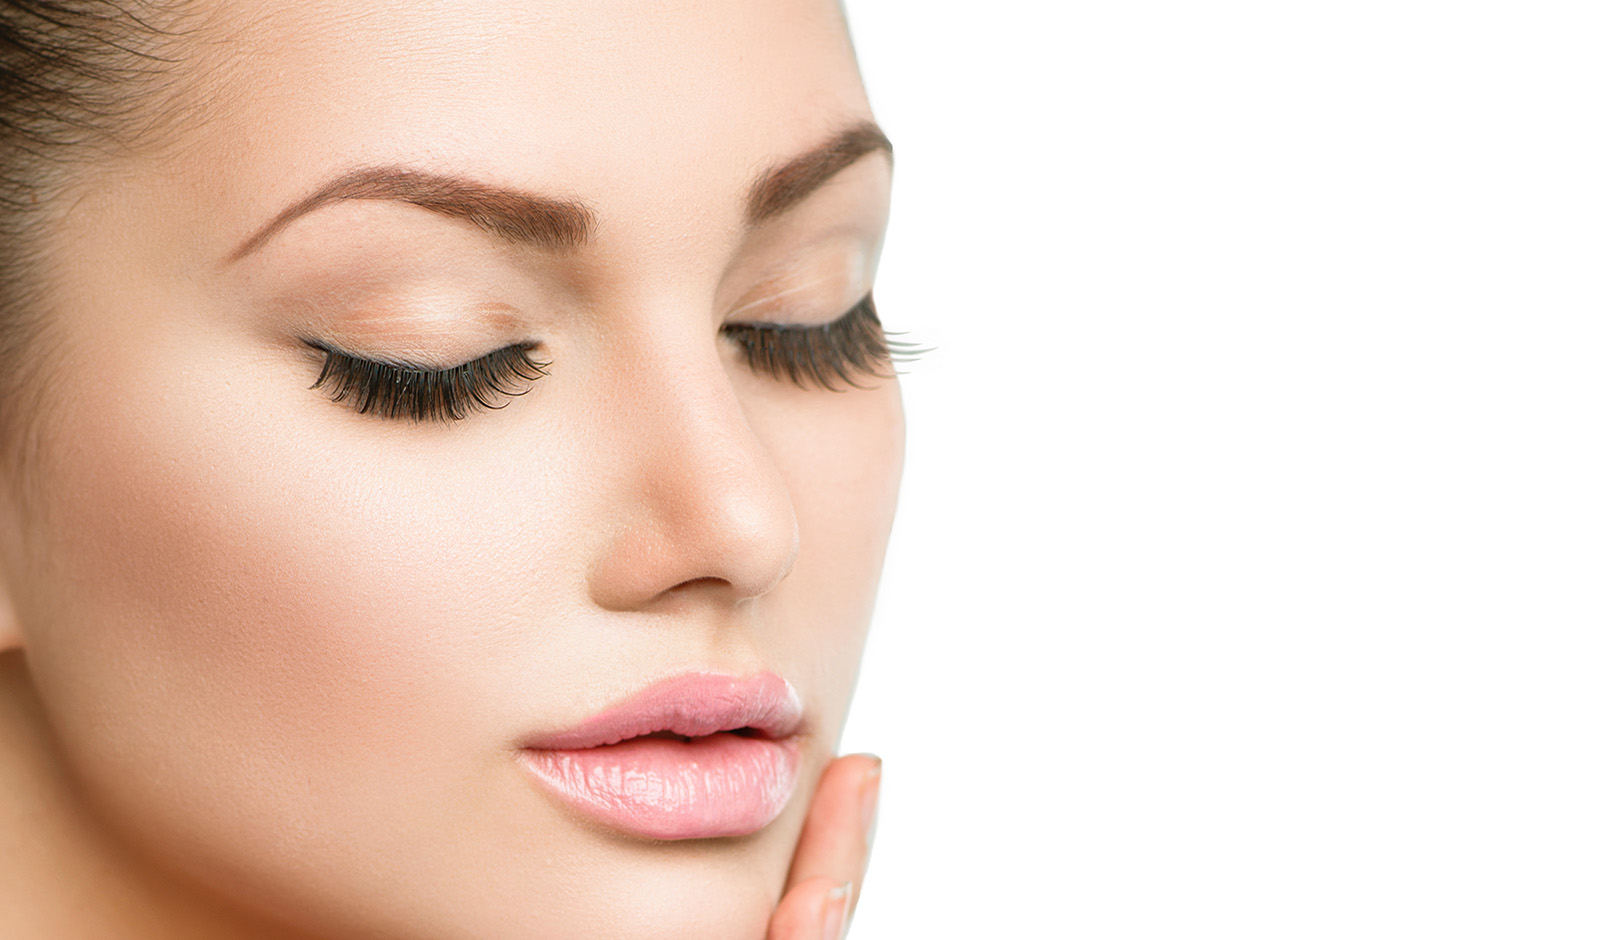 natural-oils-lip-balm-woman-with-natural-lips